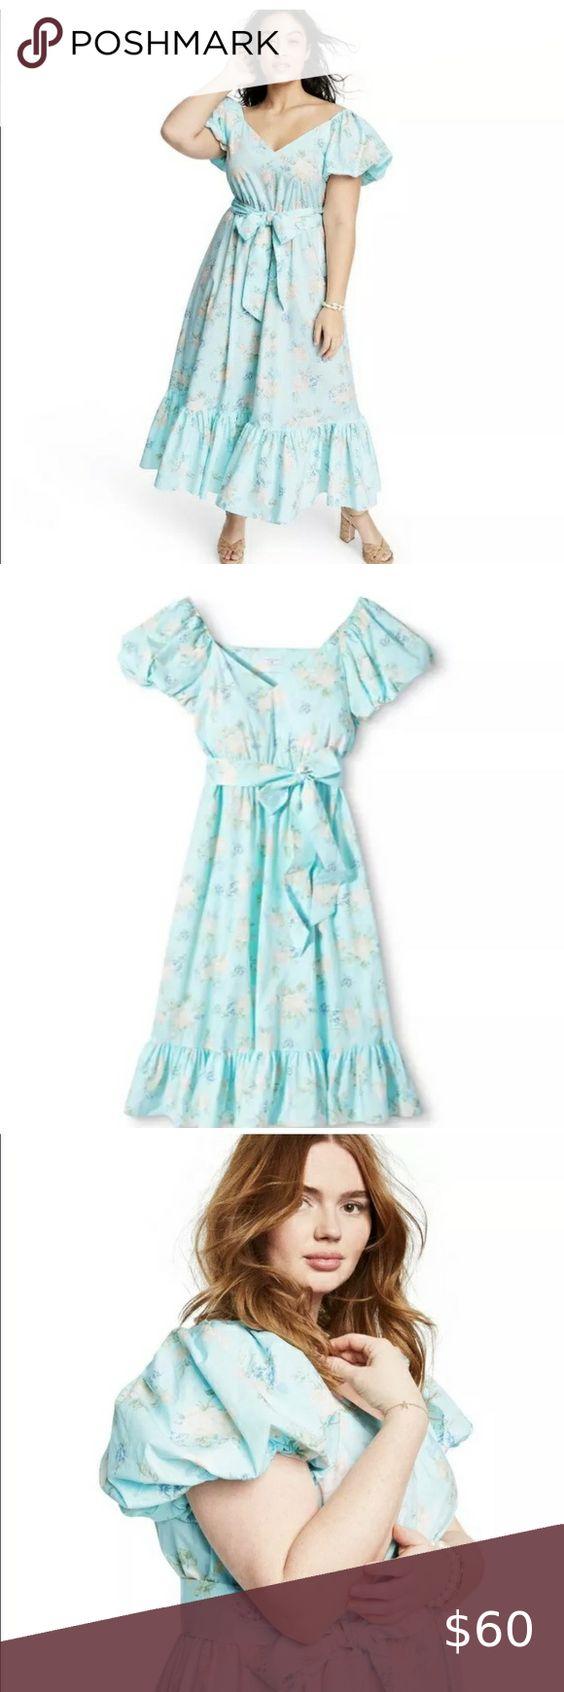 Loveshackfancy For Target Plus Size Maxi Floral 14 Plus Size Maxi Stunning Dresses Plus Size [ 1692 x 564 Pixel ]